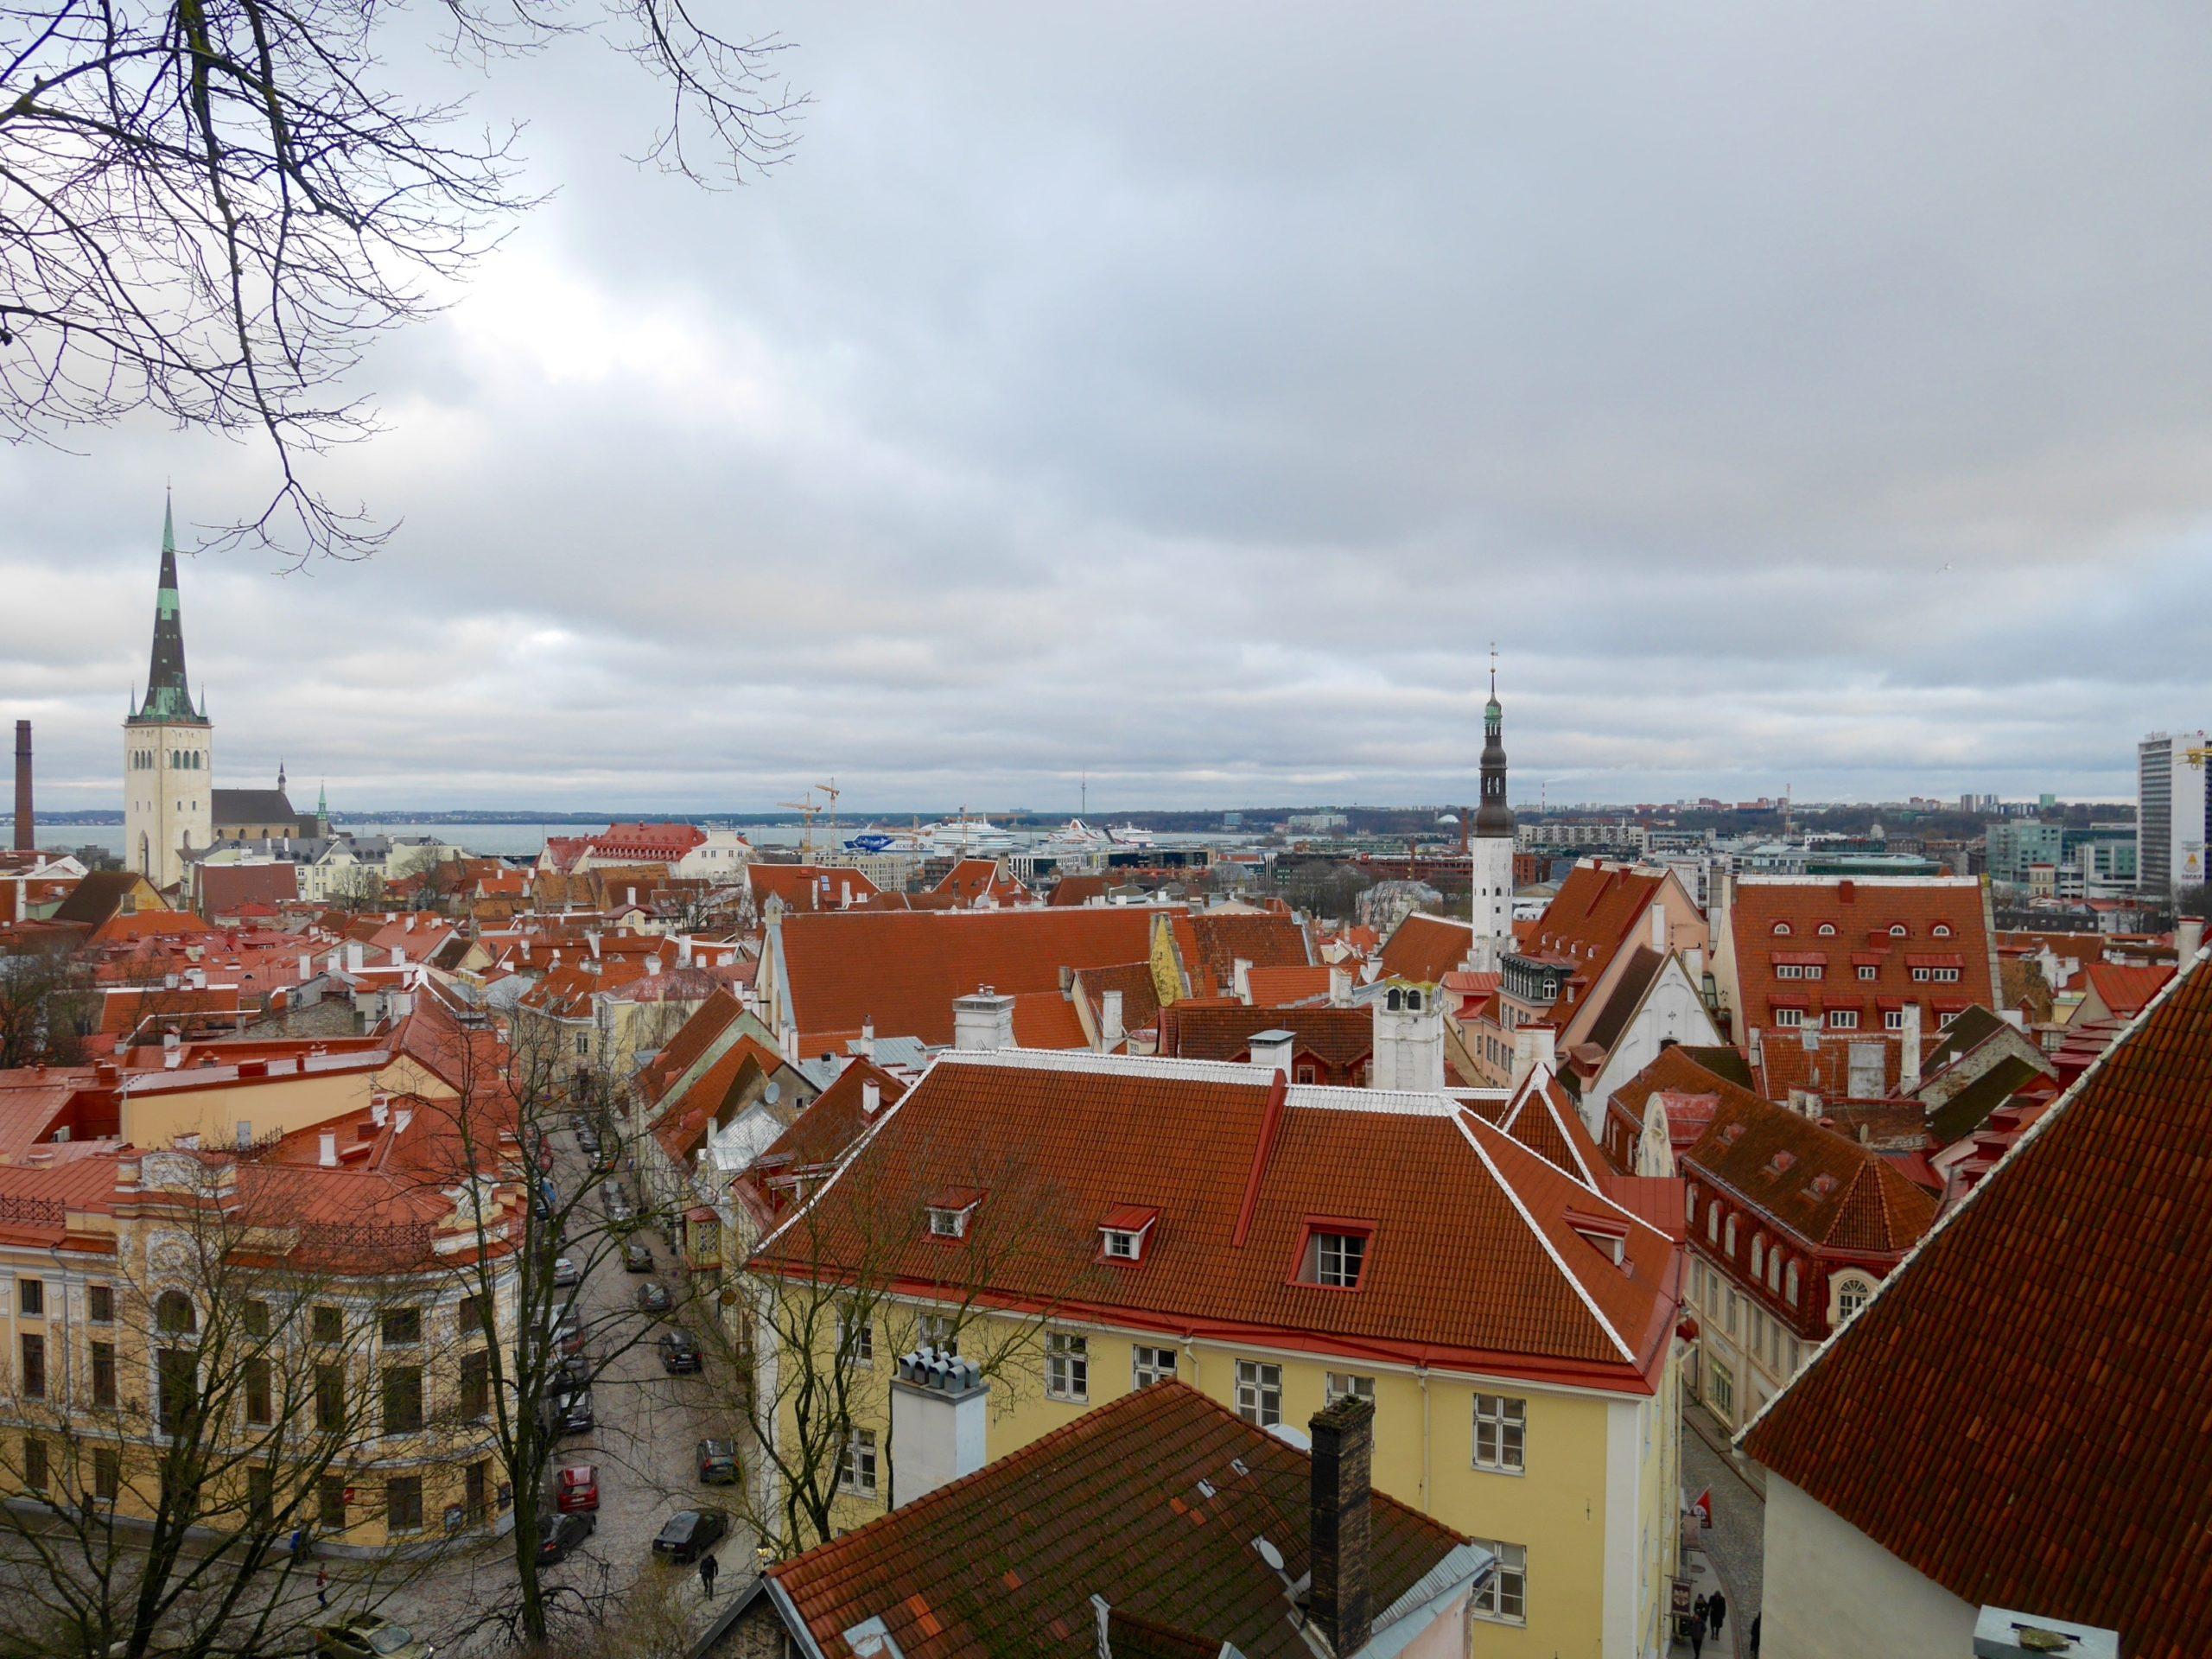 Cosa fare tre giorni a Tallinn e dintorni sara caulfield